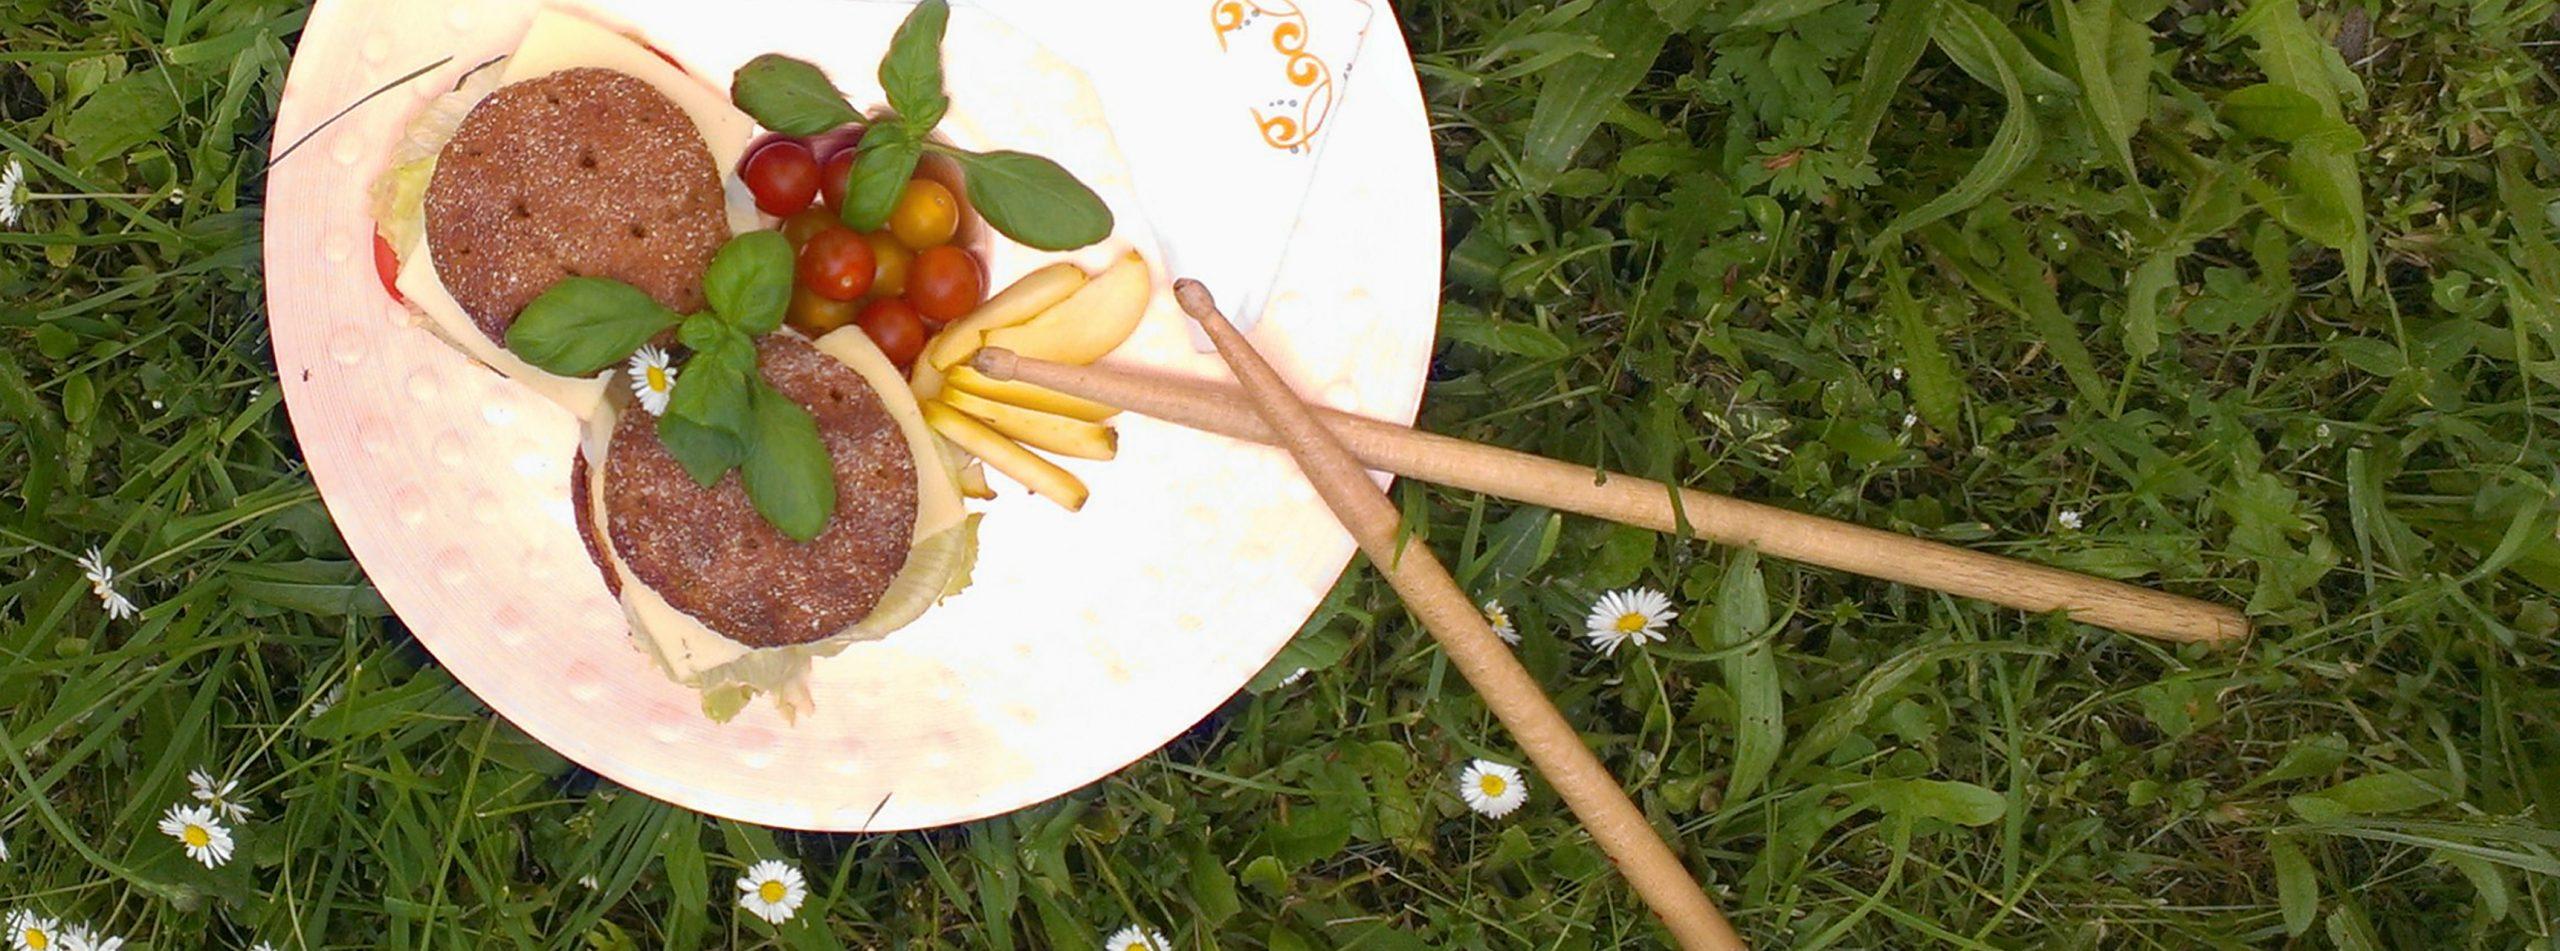 Wiesenpicknick mit Percussion-Geschirr